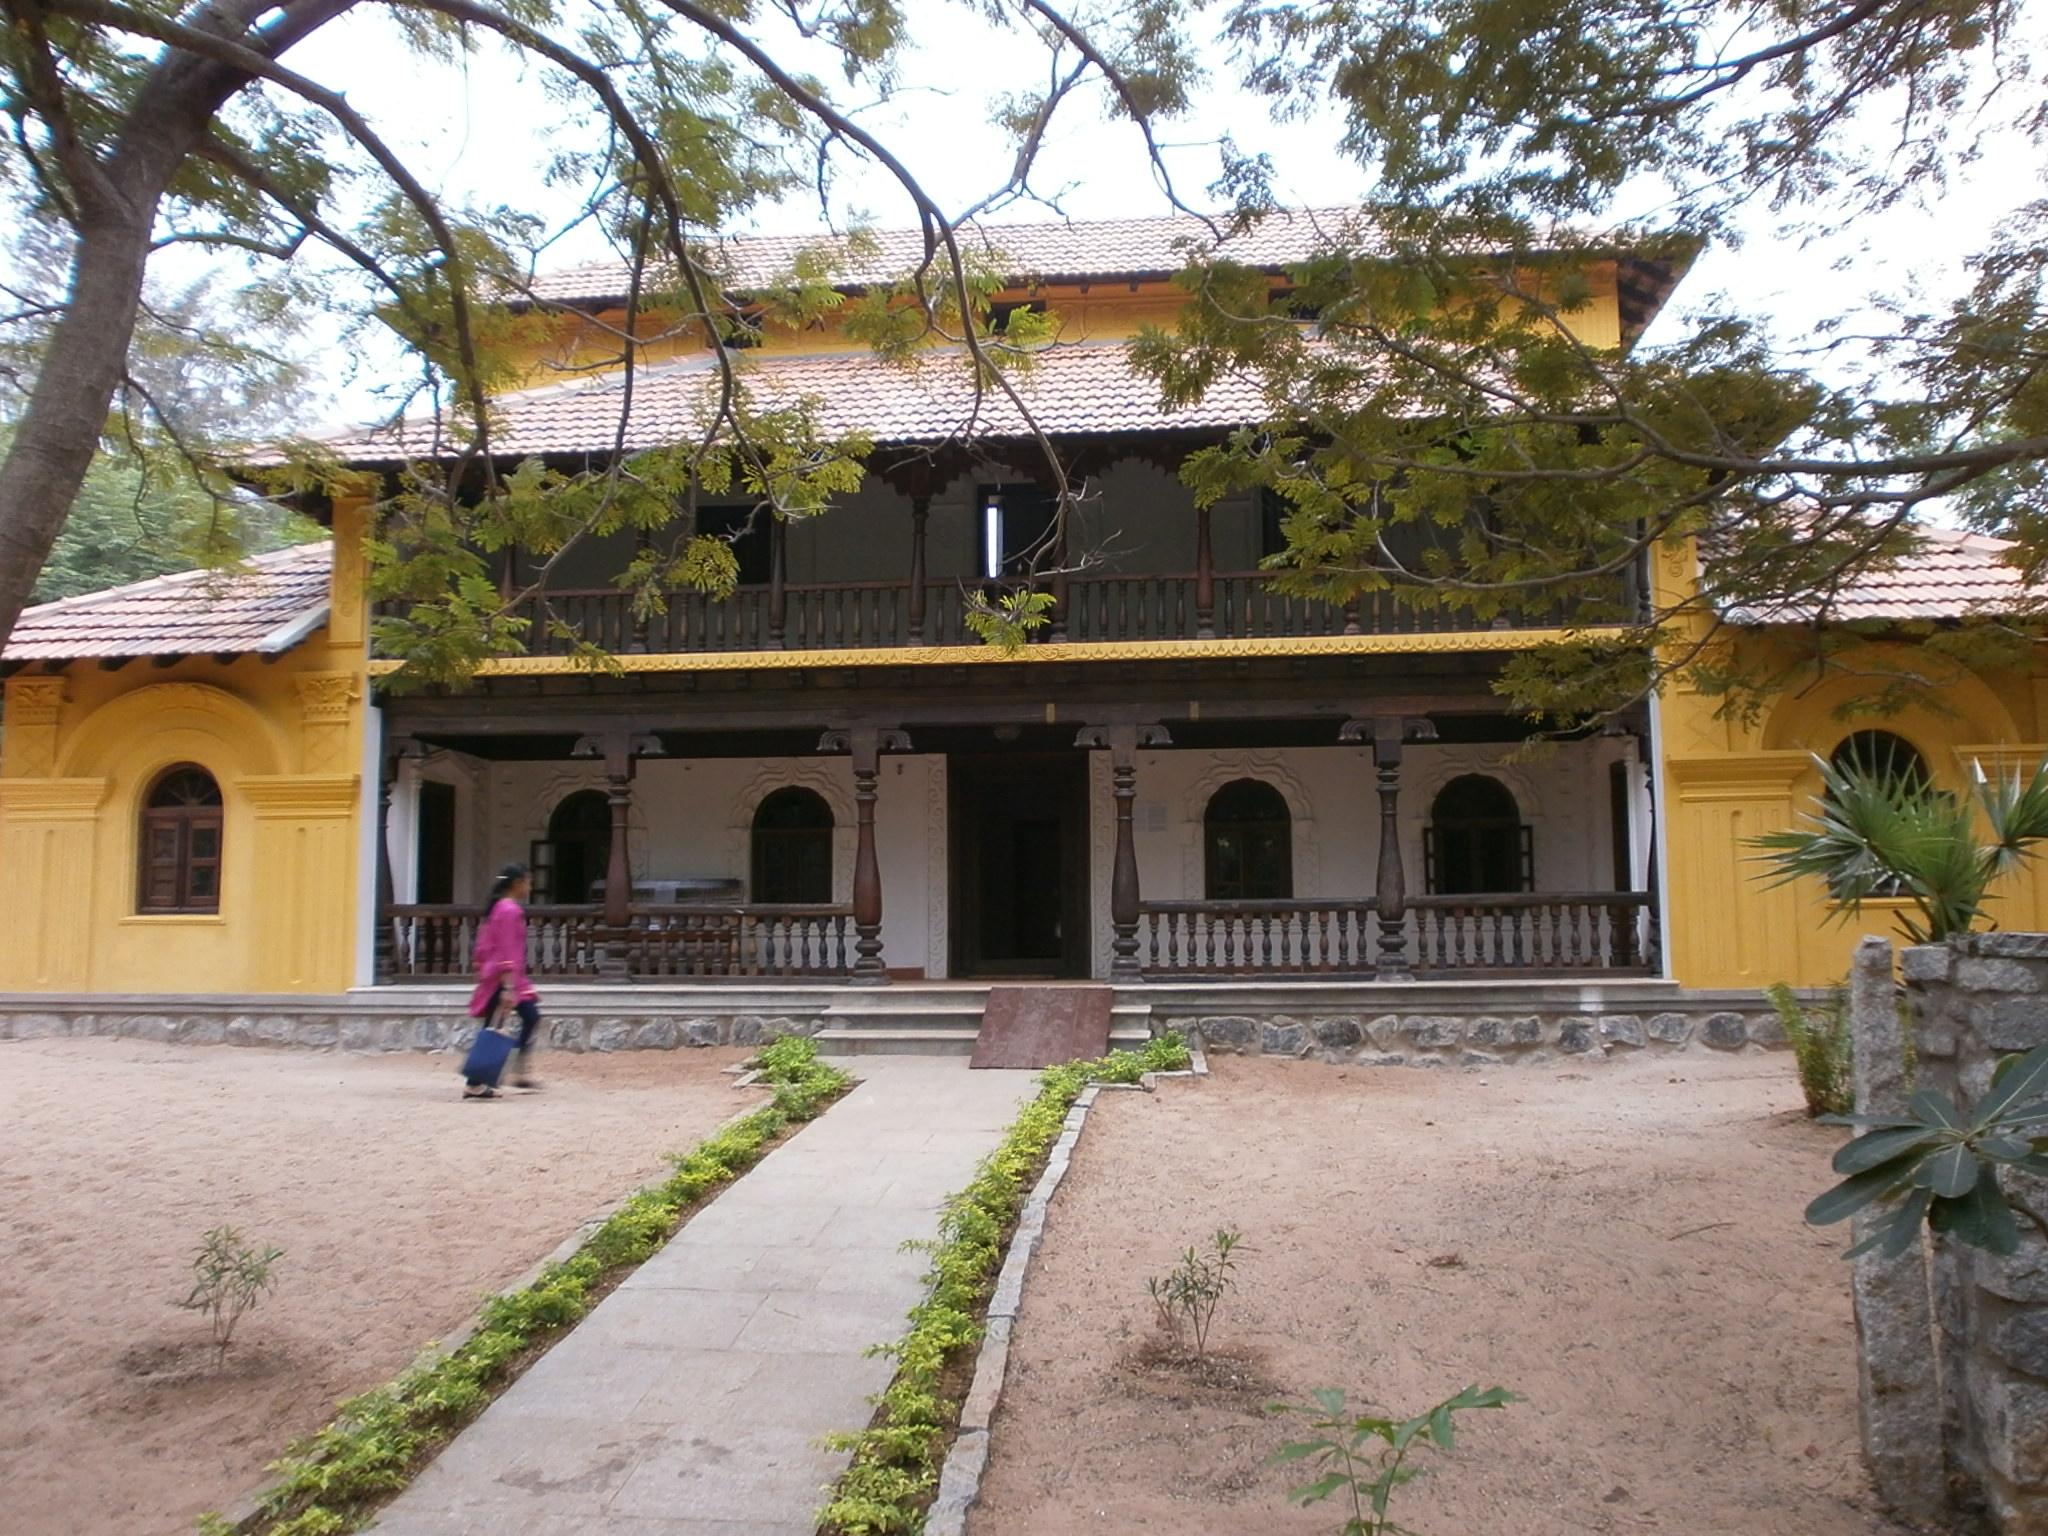 http://upload.wikimedia.org/wikipedia/commons/d/d9/Dakshina-Chitra-Karnataka-House.JPG